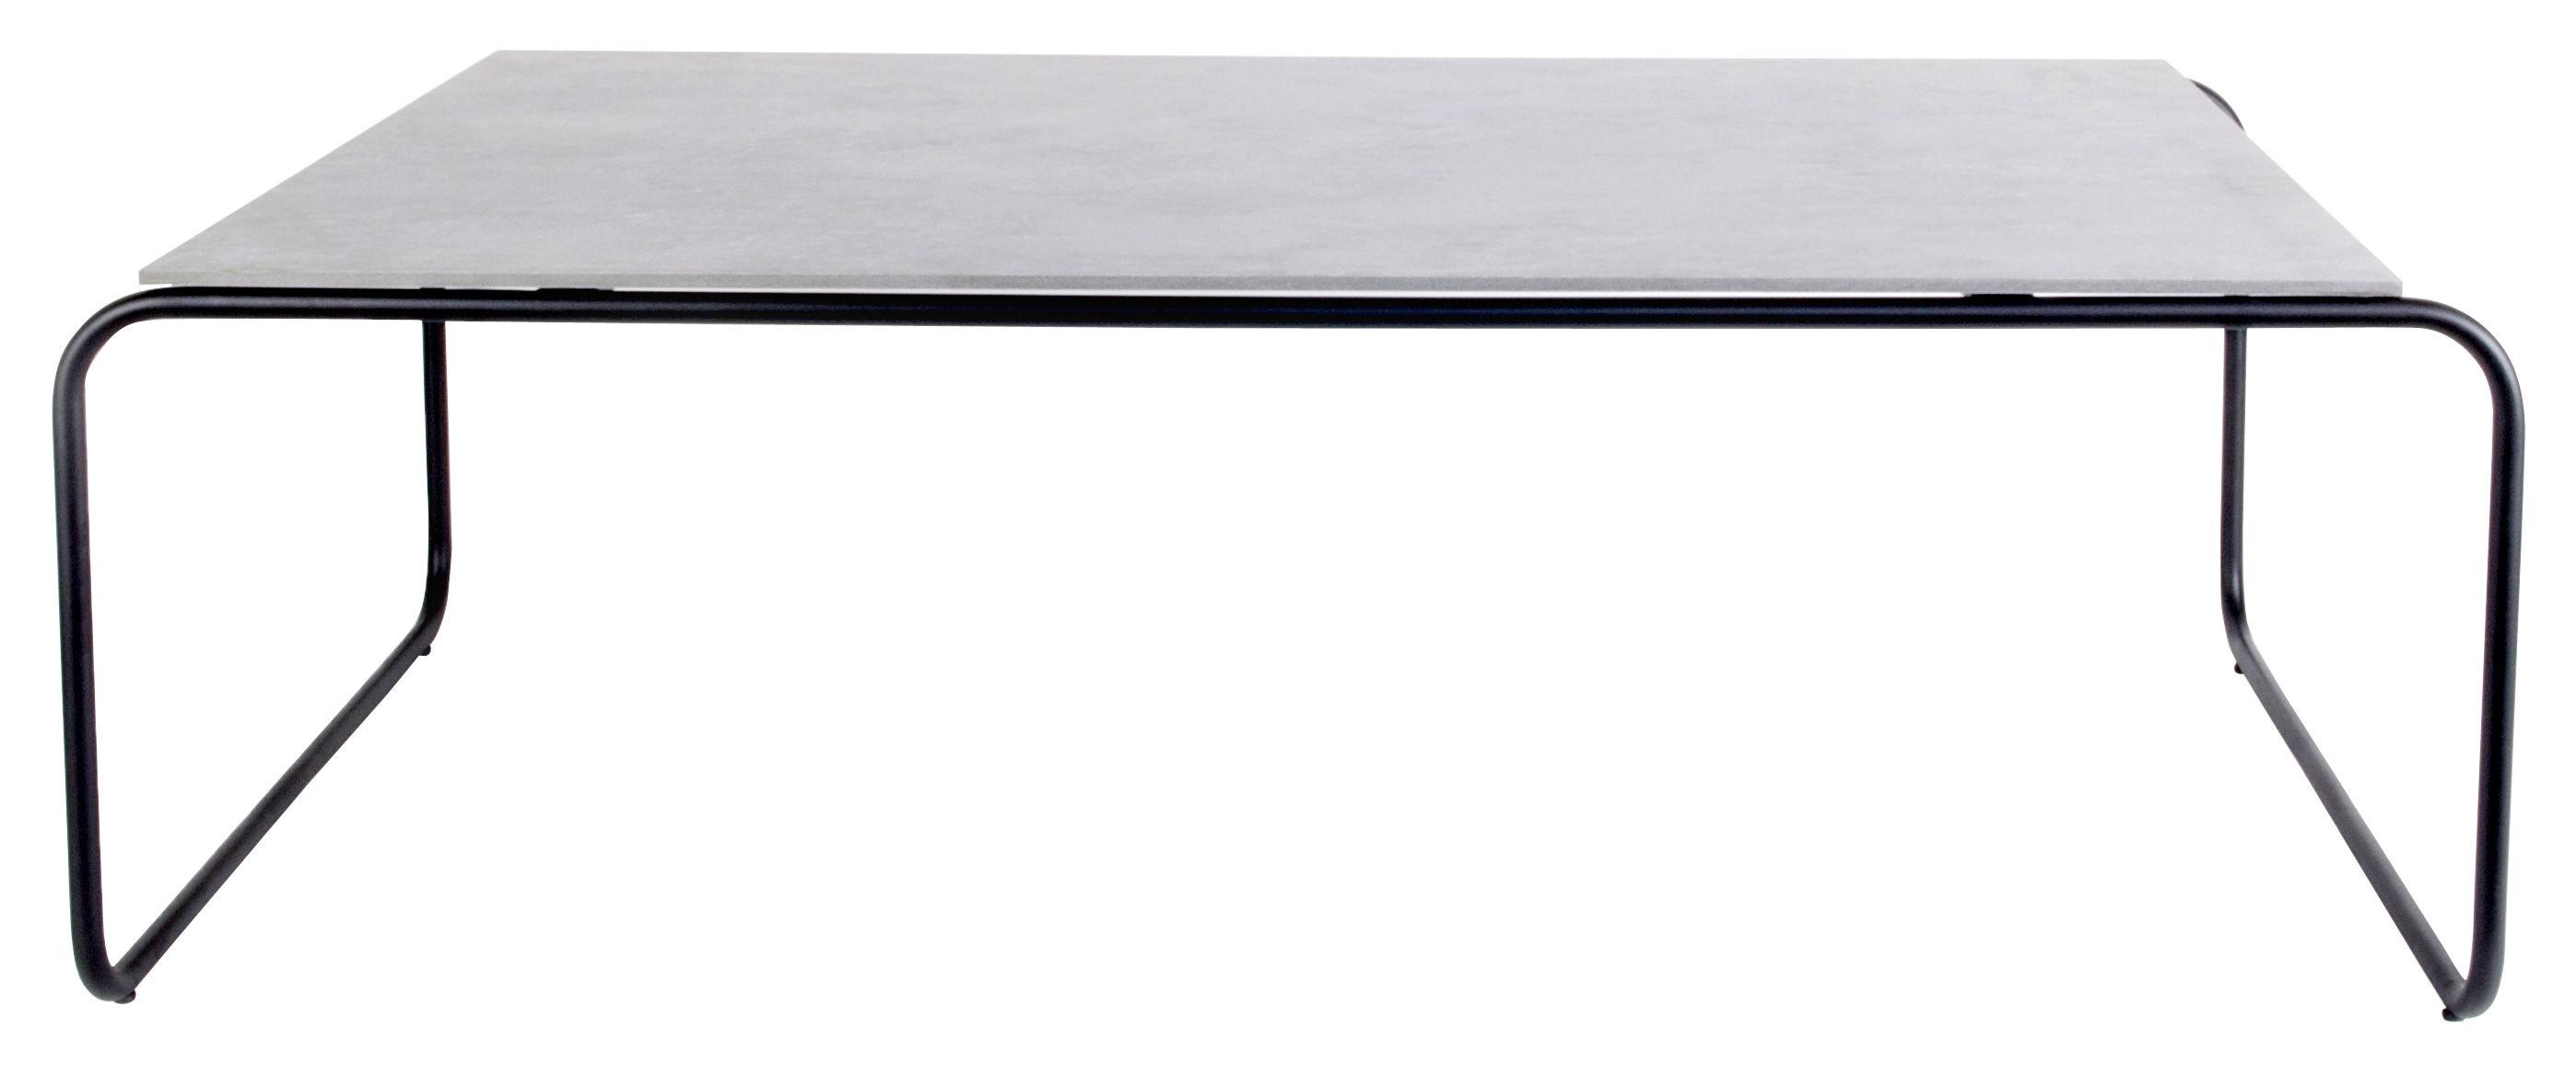 Furniture - Coffee Tables - Yoso Medium Coffee table - 120 x 69 x H 39 cm / Cement by XL Boom - Grey ciment / Black -  Fibre-ciment, Epoxy lacquered steel